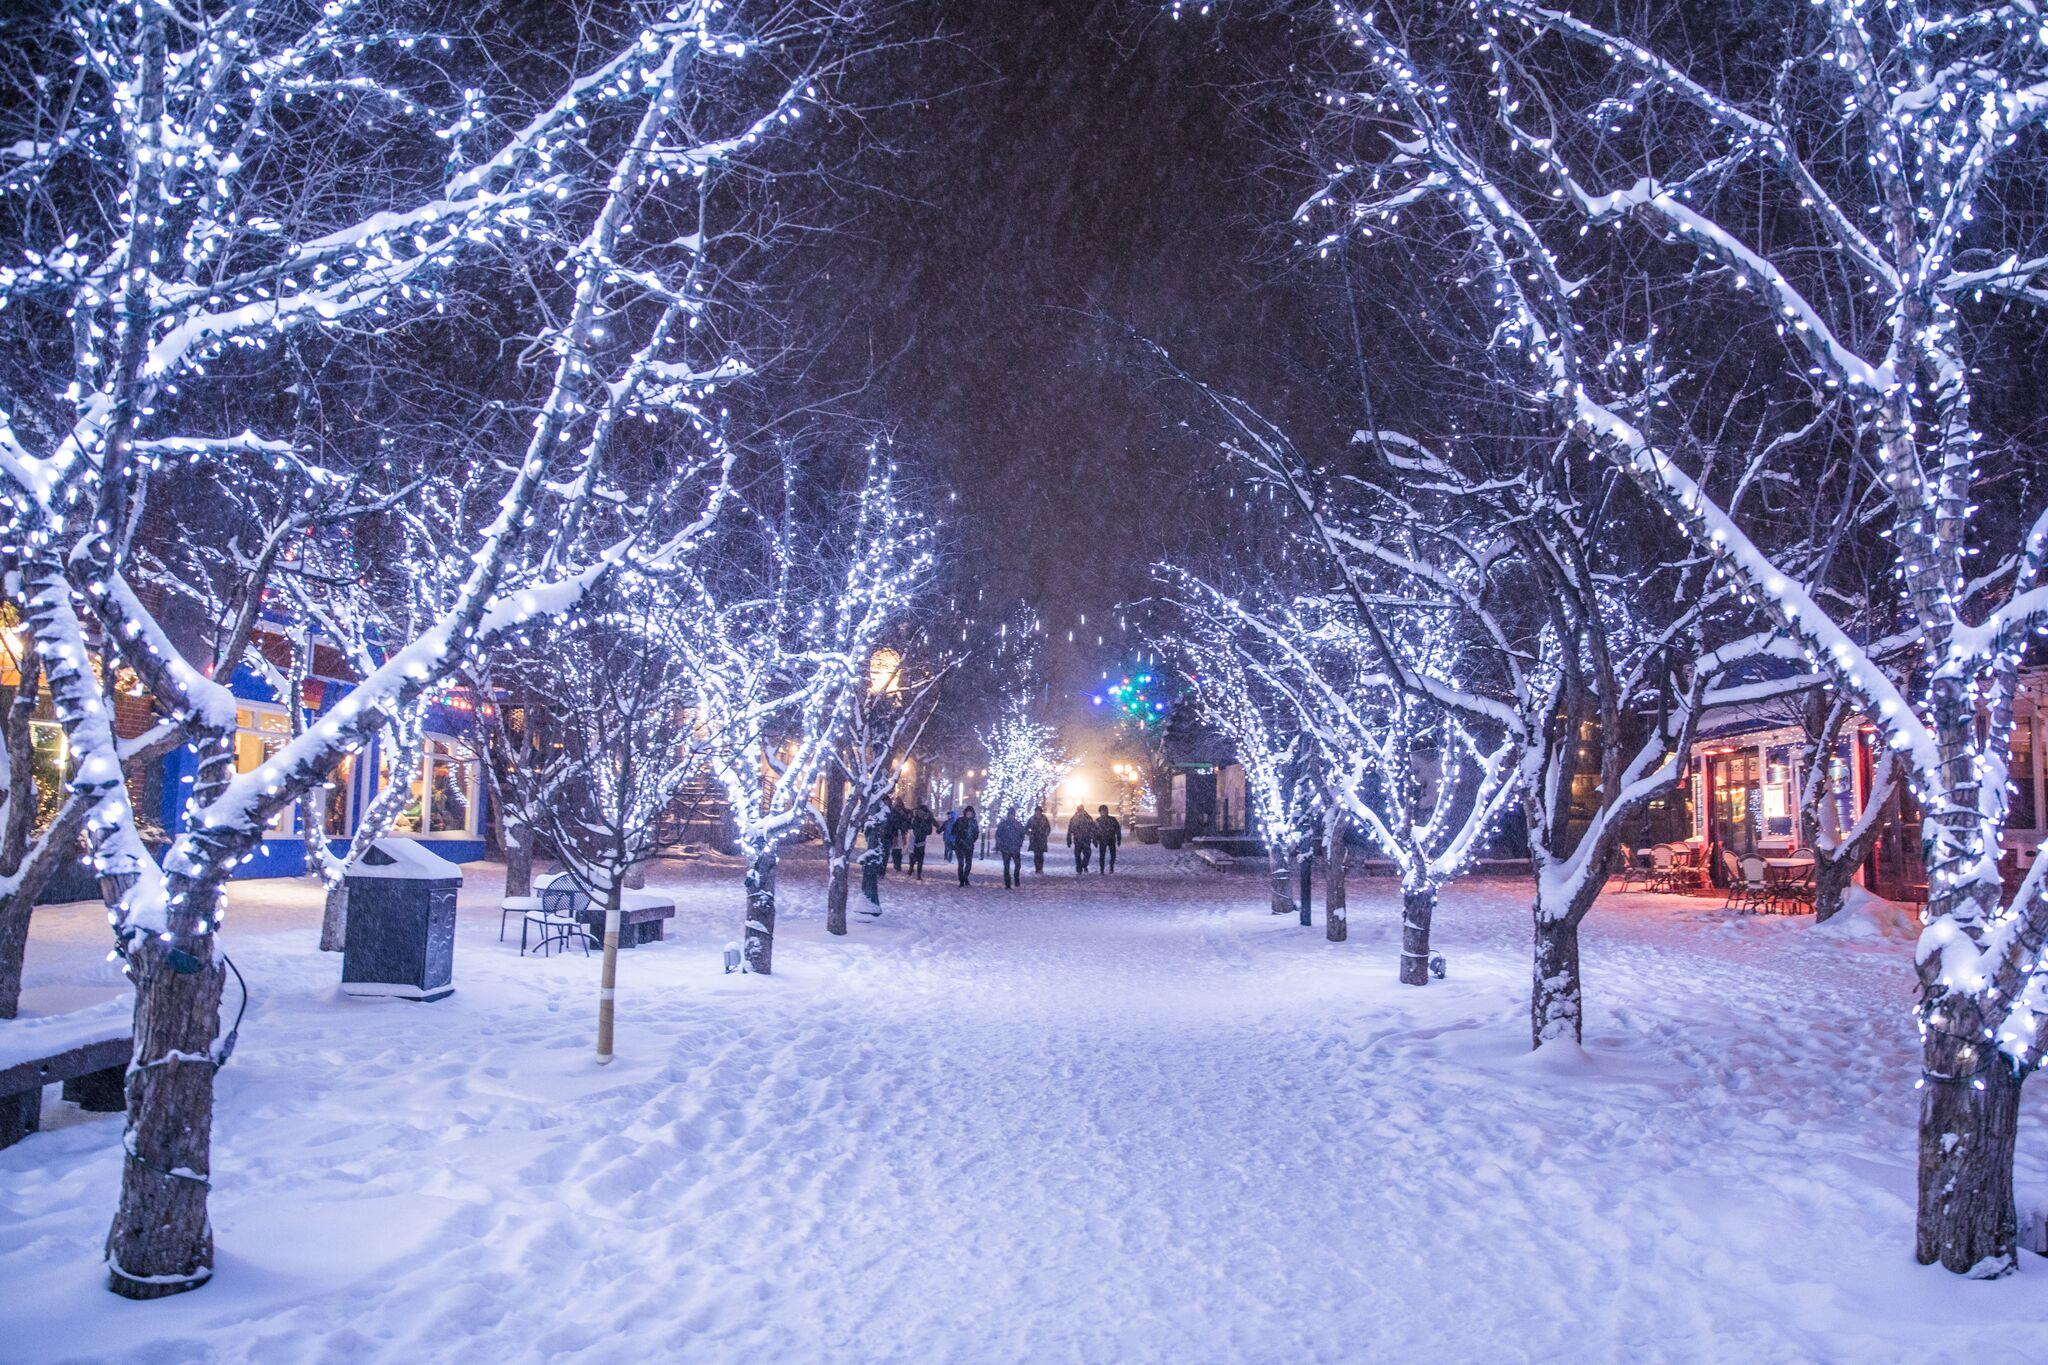 winter.nightlights.downtownsnow.redmtnproductions.jpeg